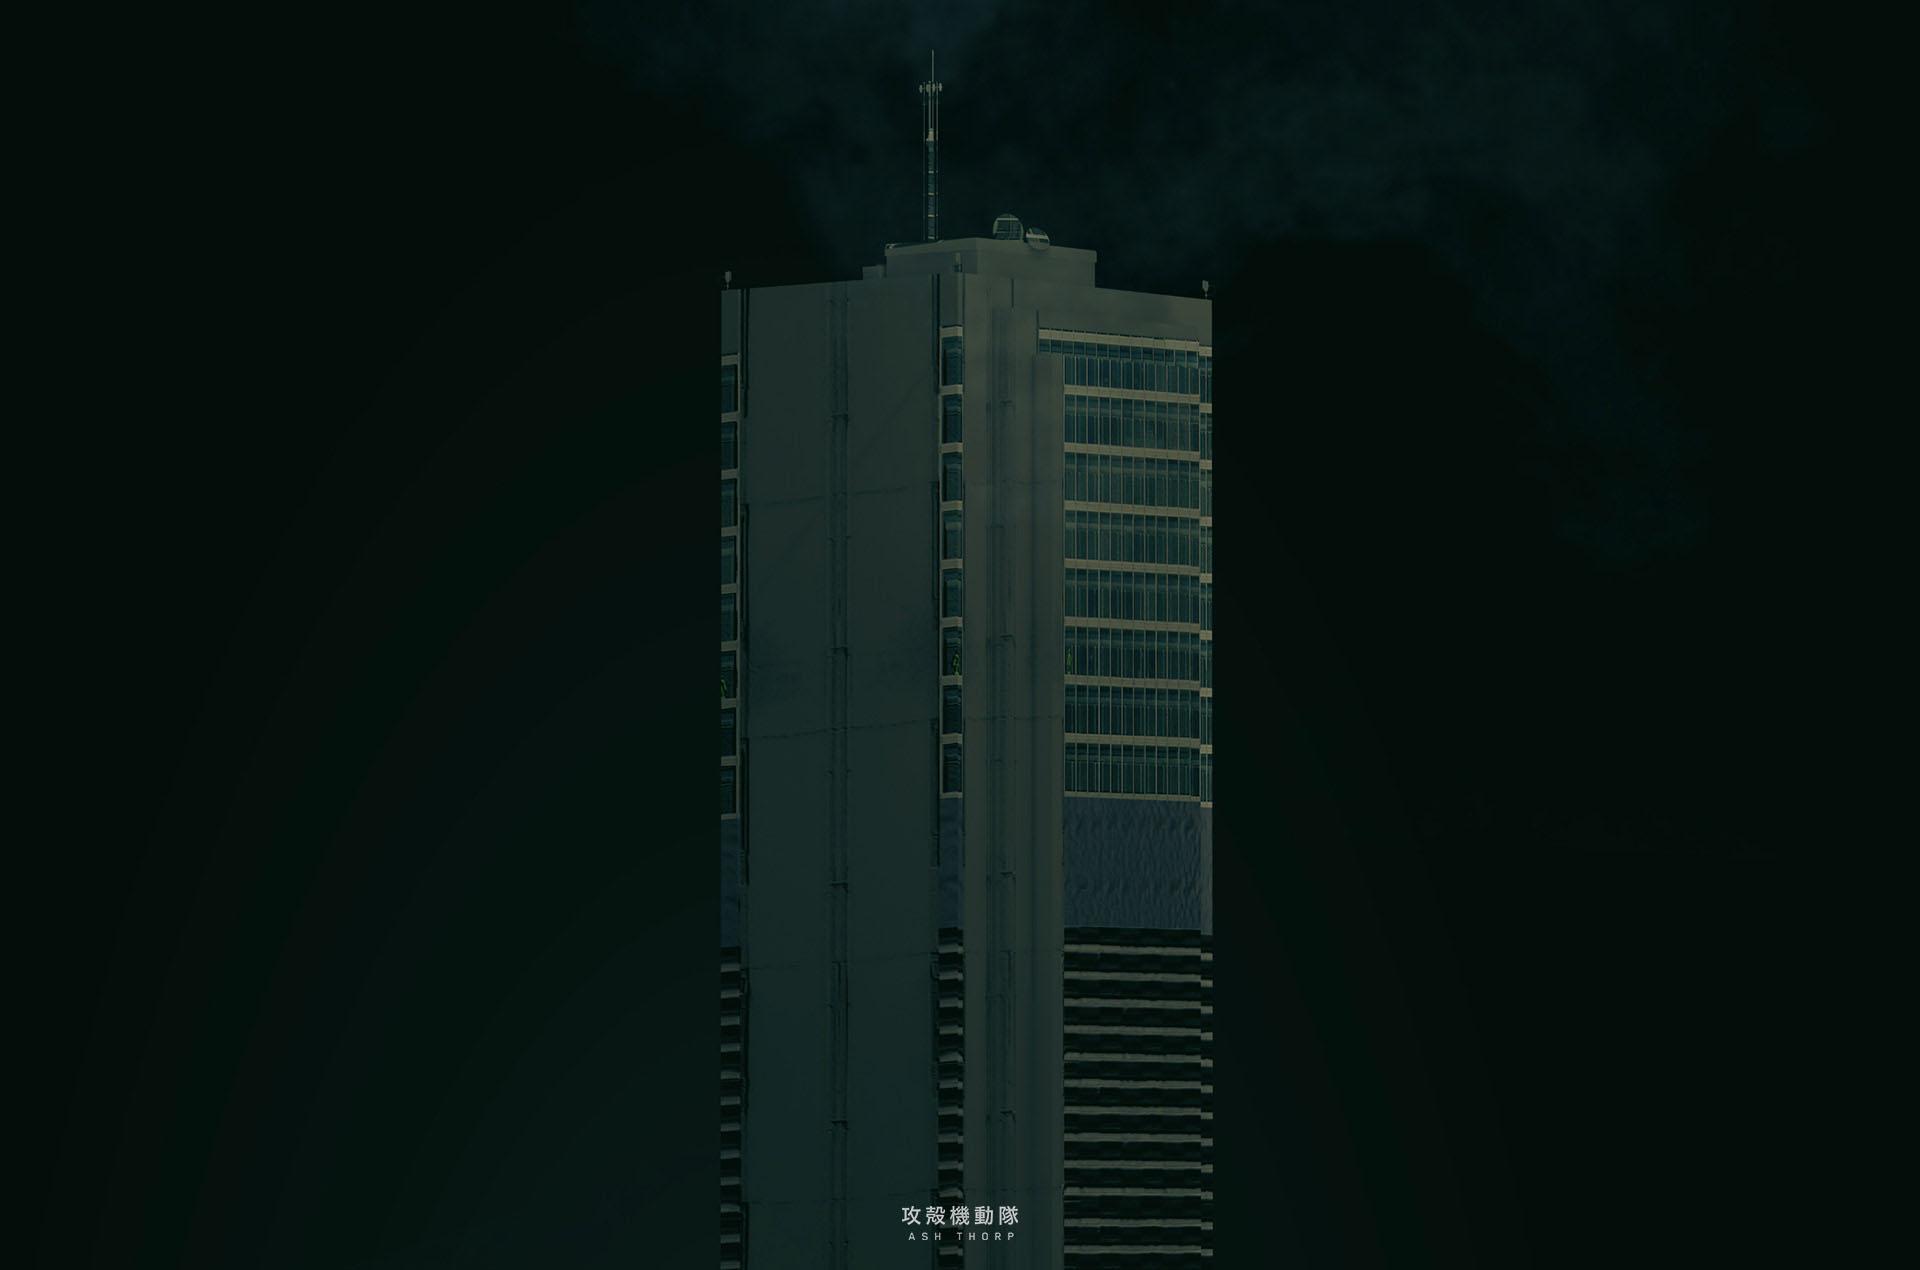 ghost in the shell-elmaaltshift-3